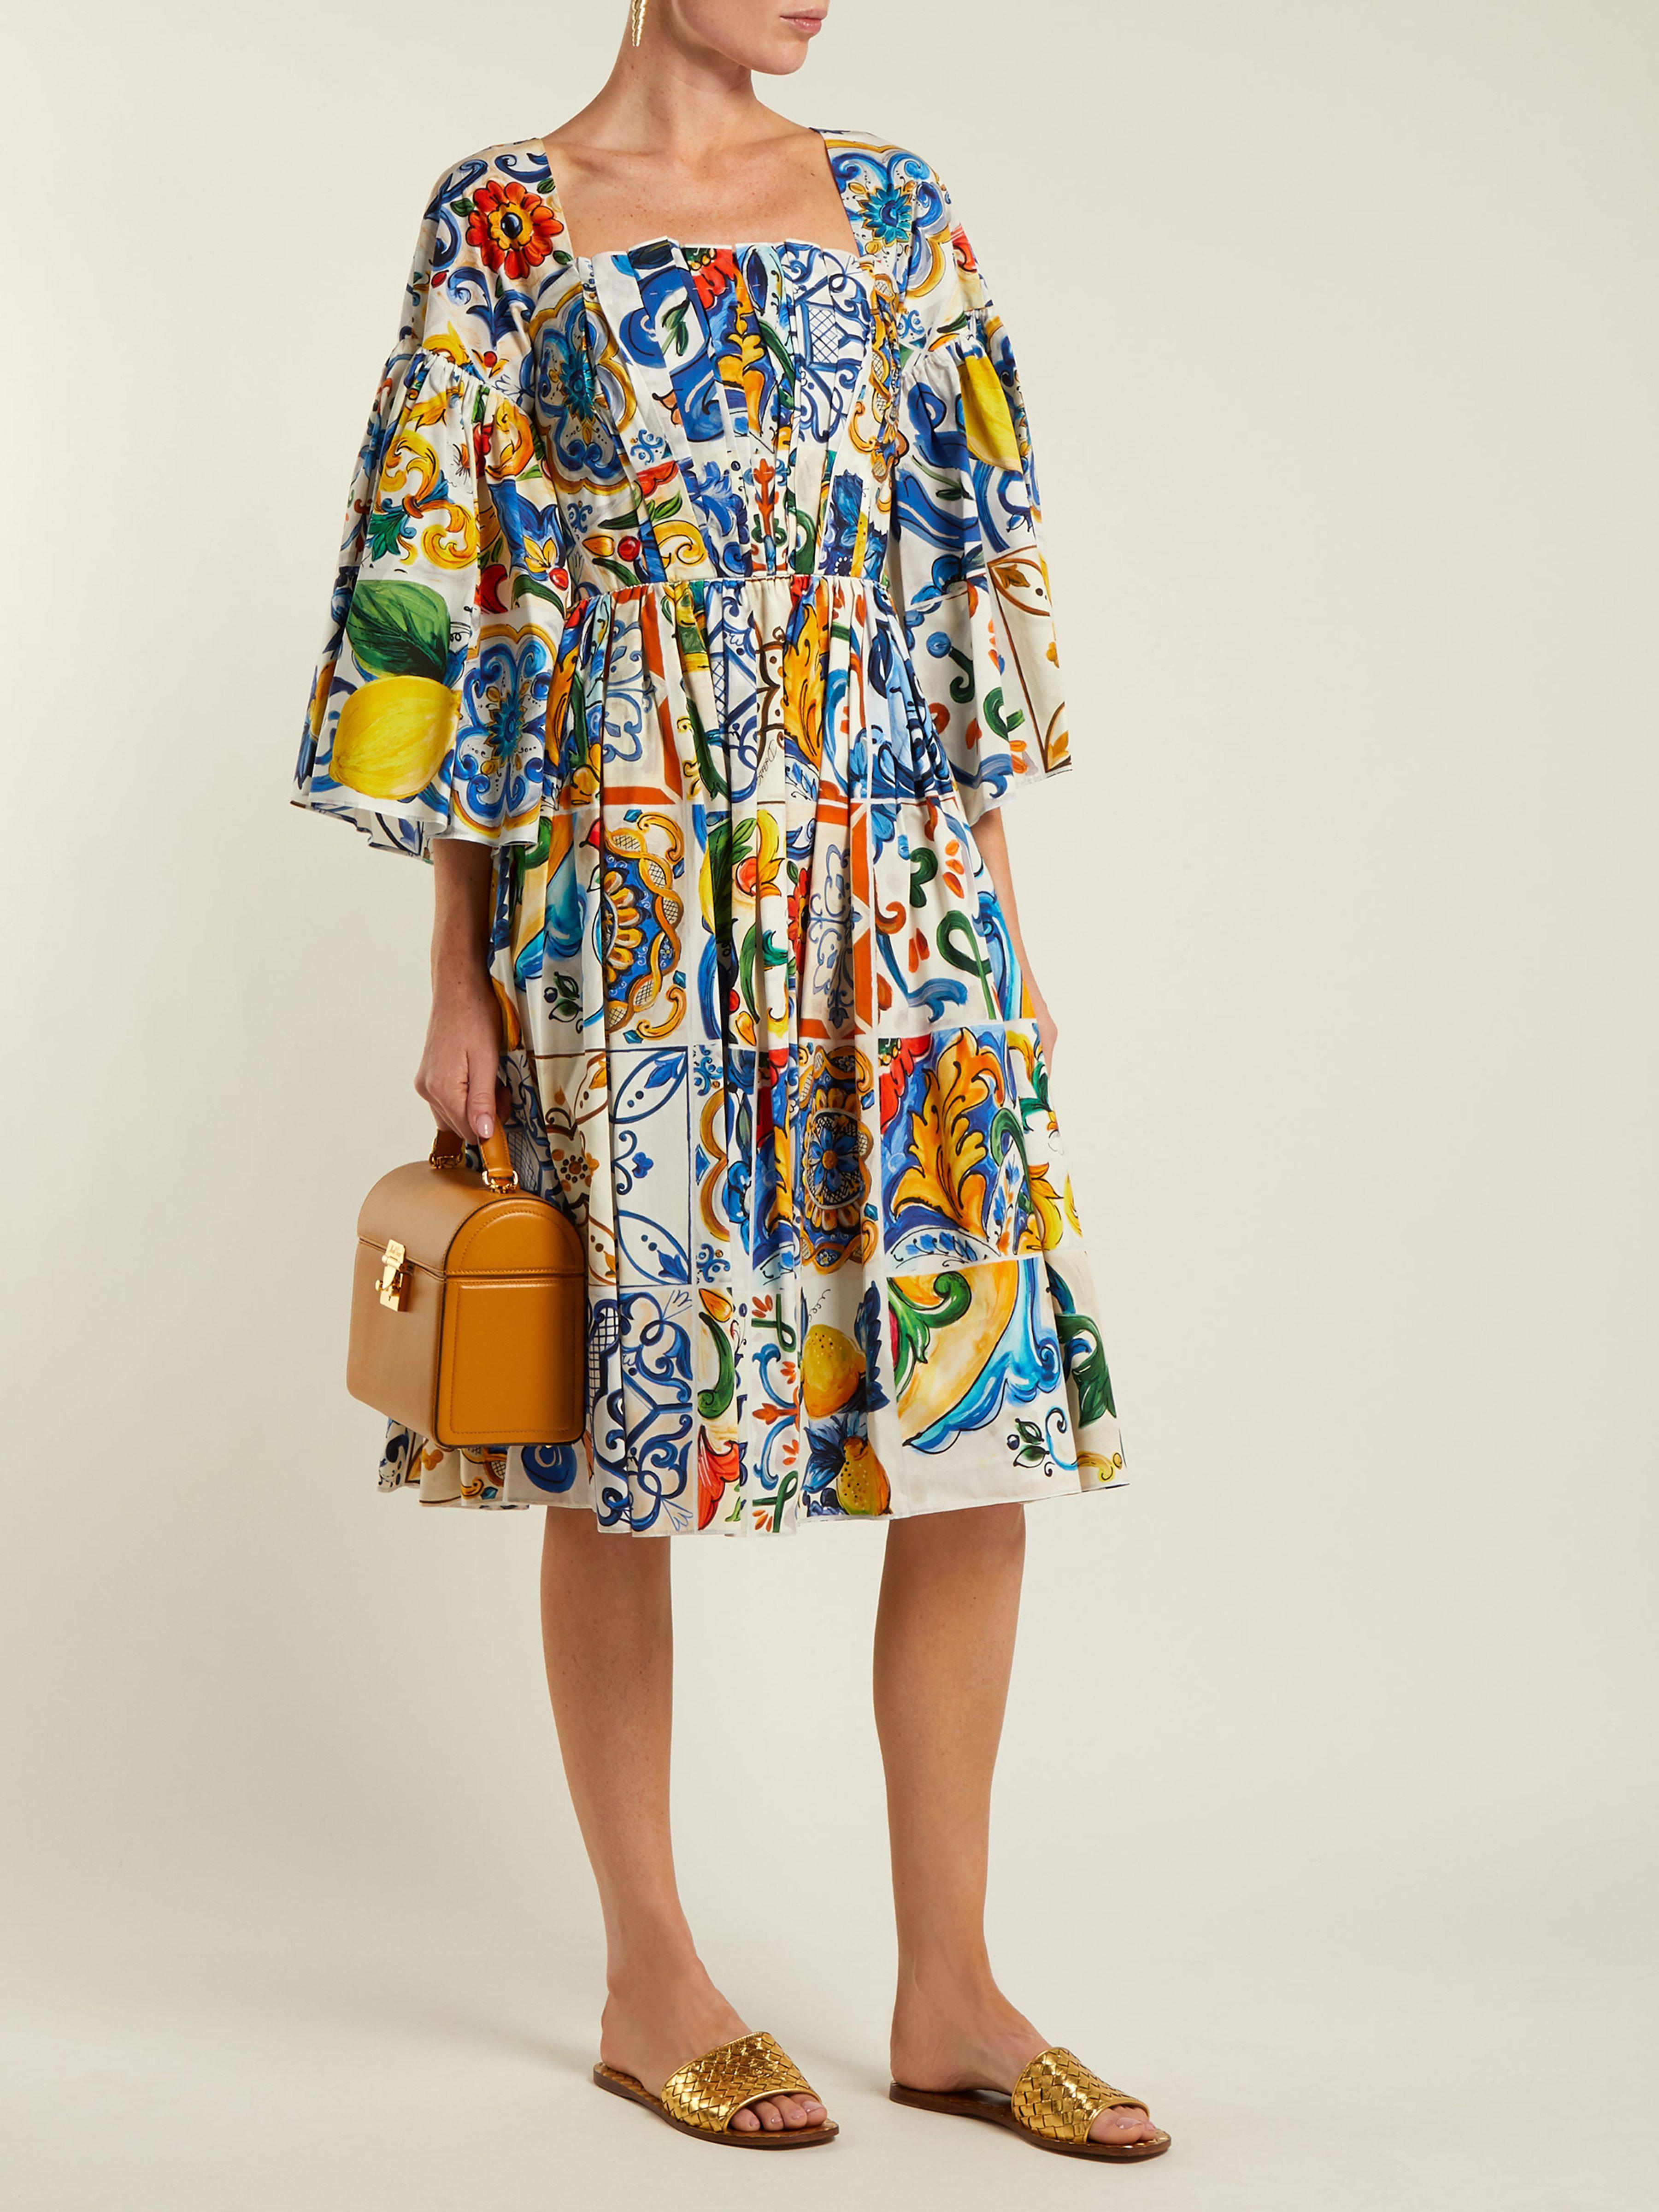 75caab03b106 Dolce   Gabbana Majolica Print Square Neck Cotton Poplin Dress in Blue -  Save 17% - Lyst